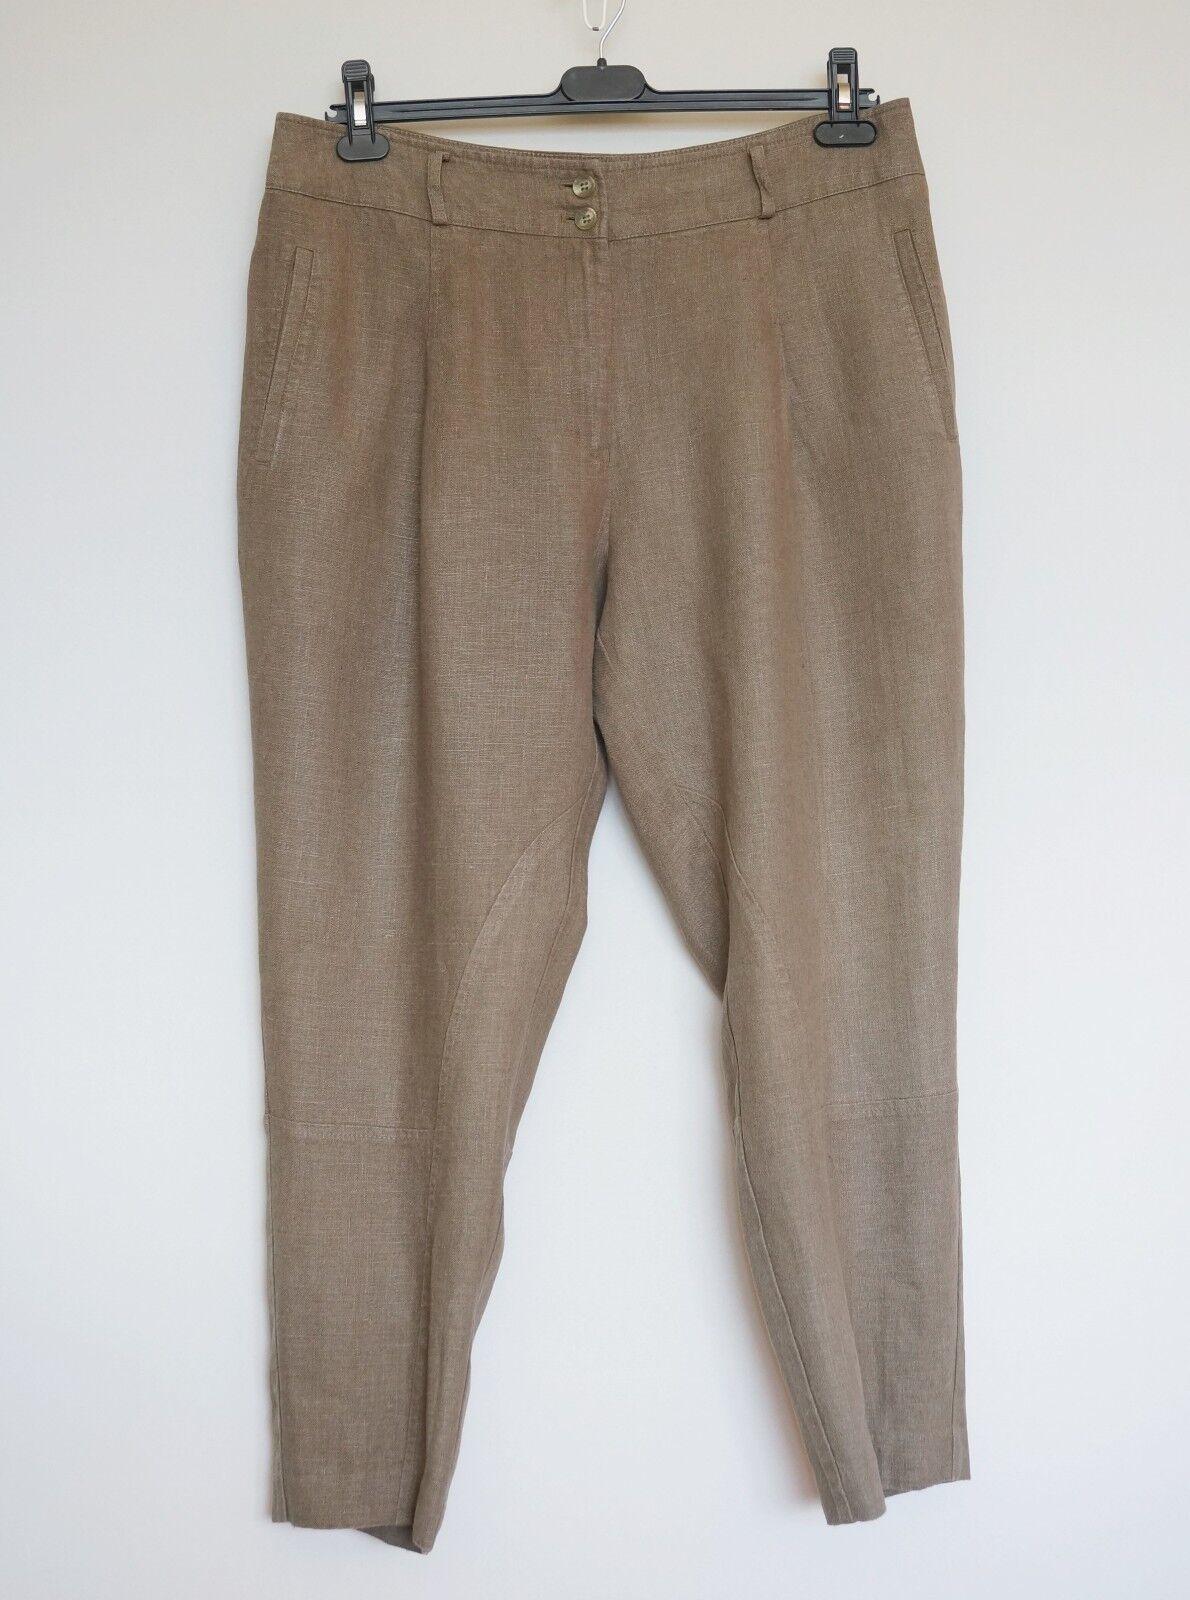 Ivan Grundahl 100% Linen Beige Trousers, Size 42